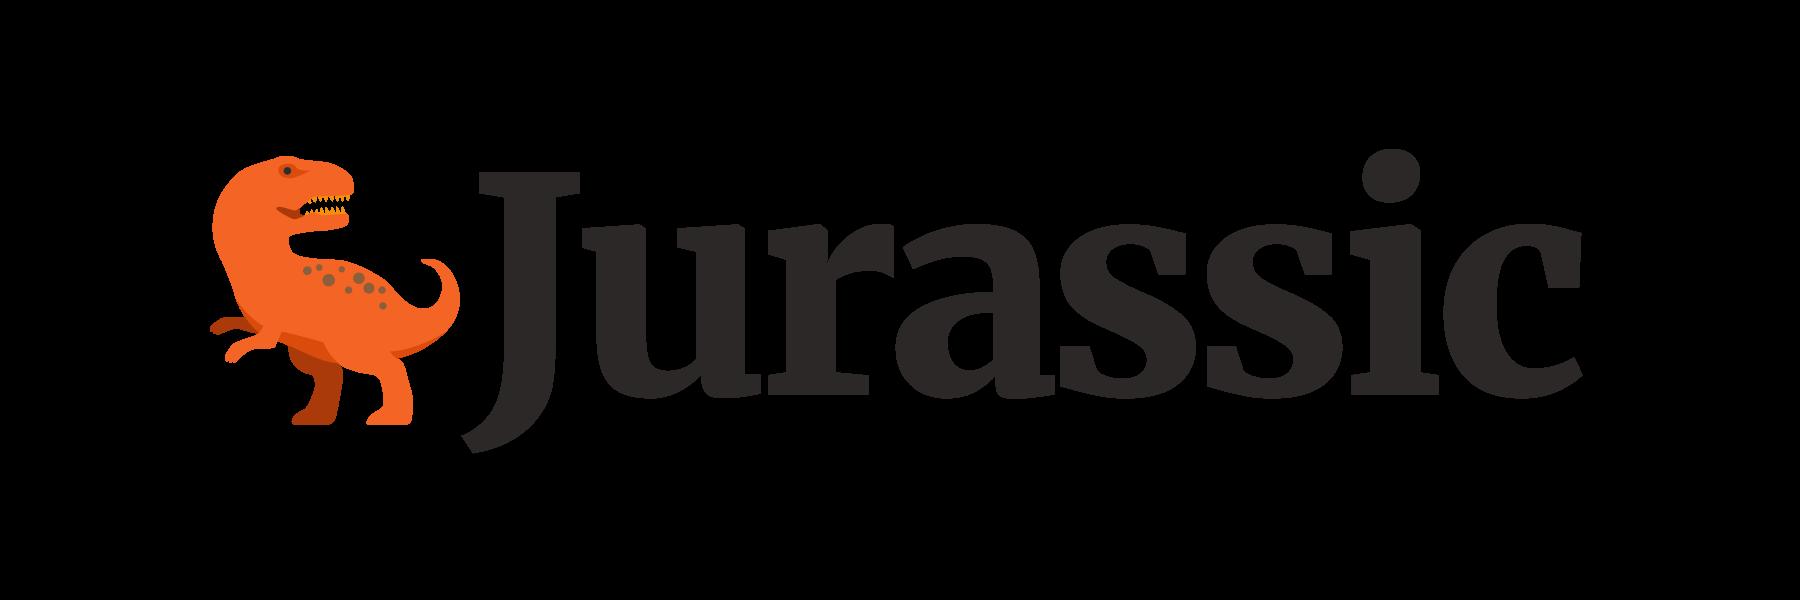 Jurassic Logo